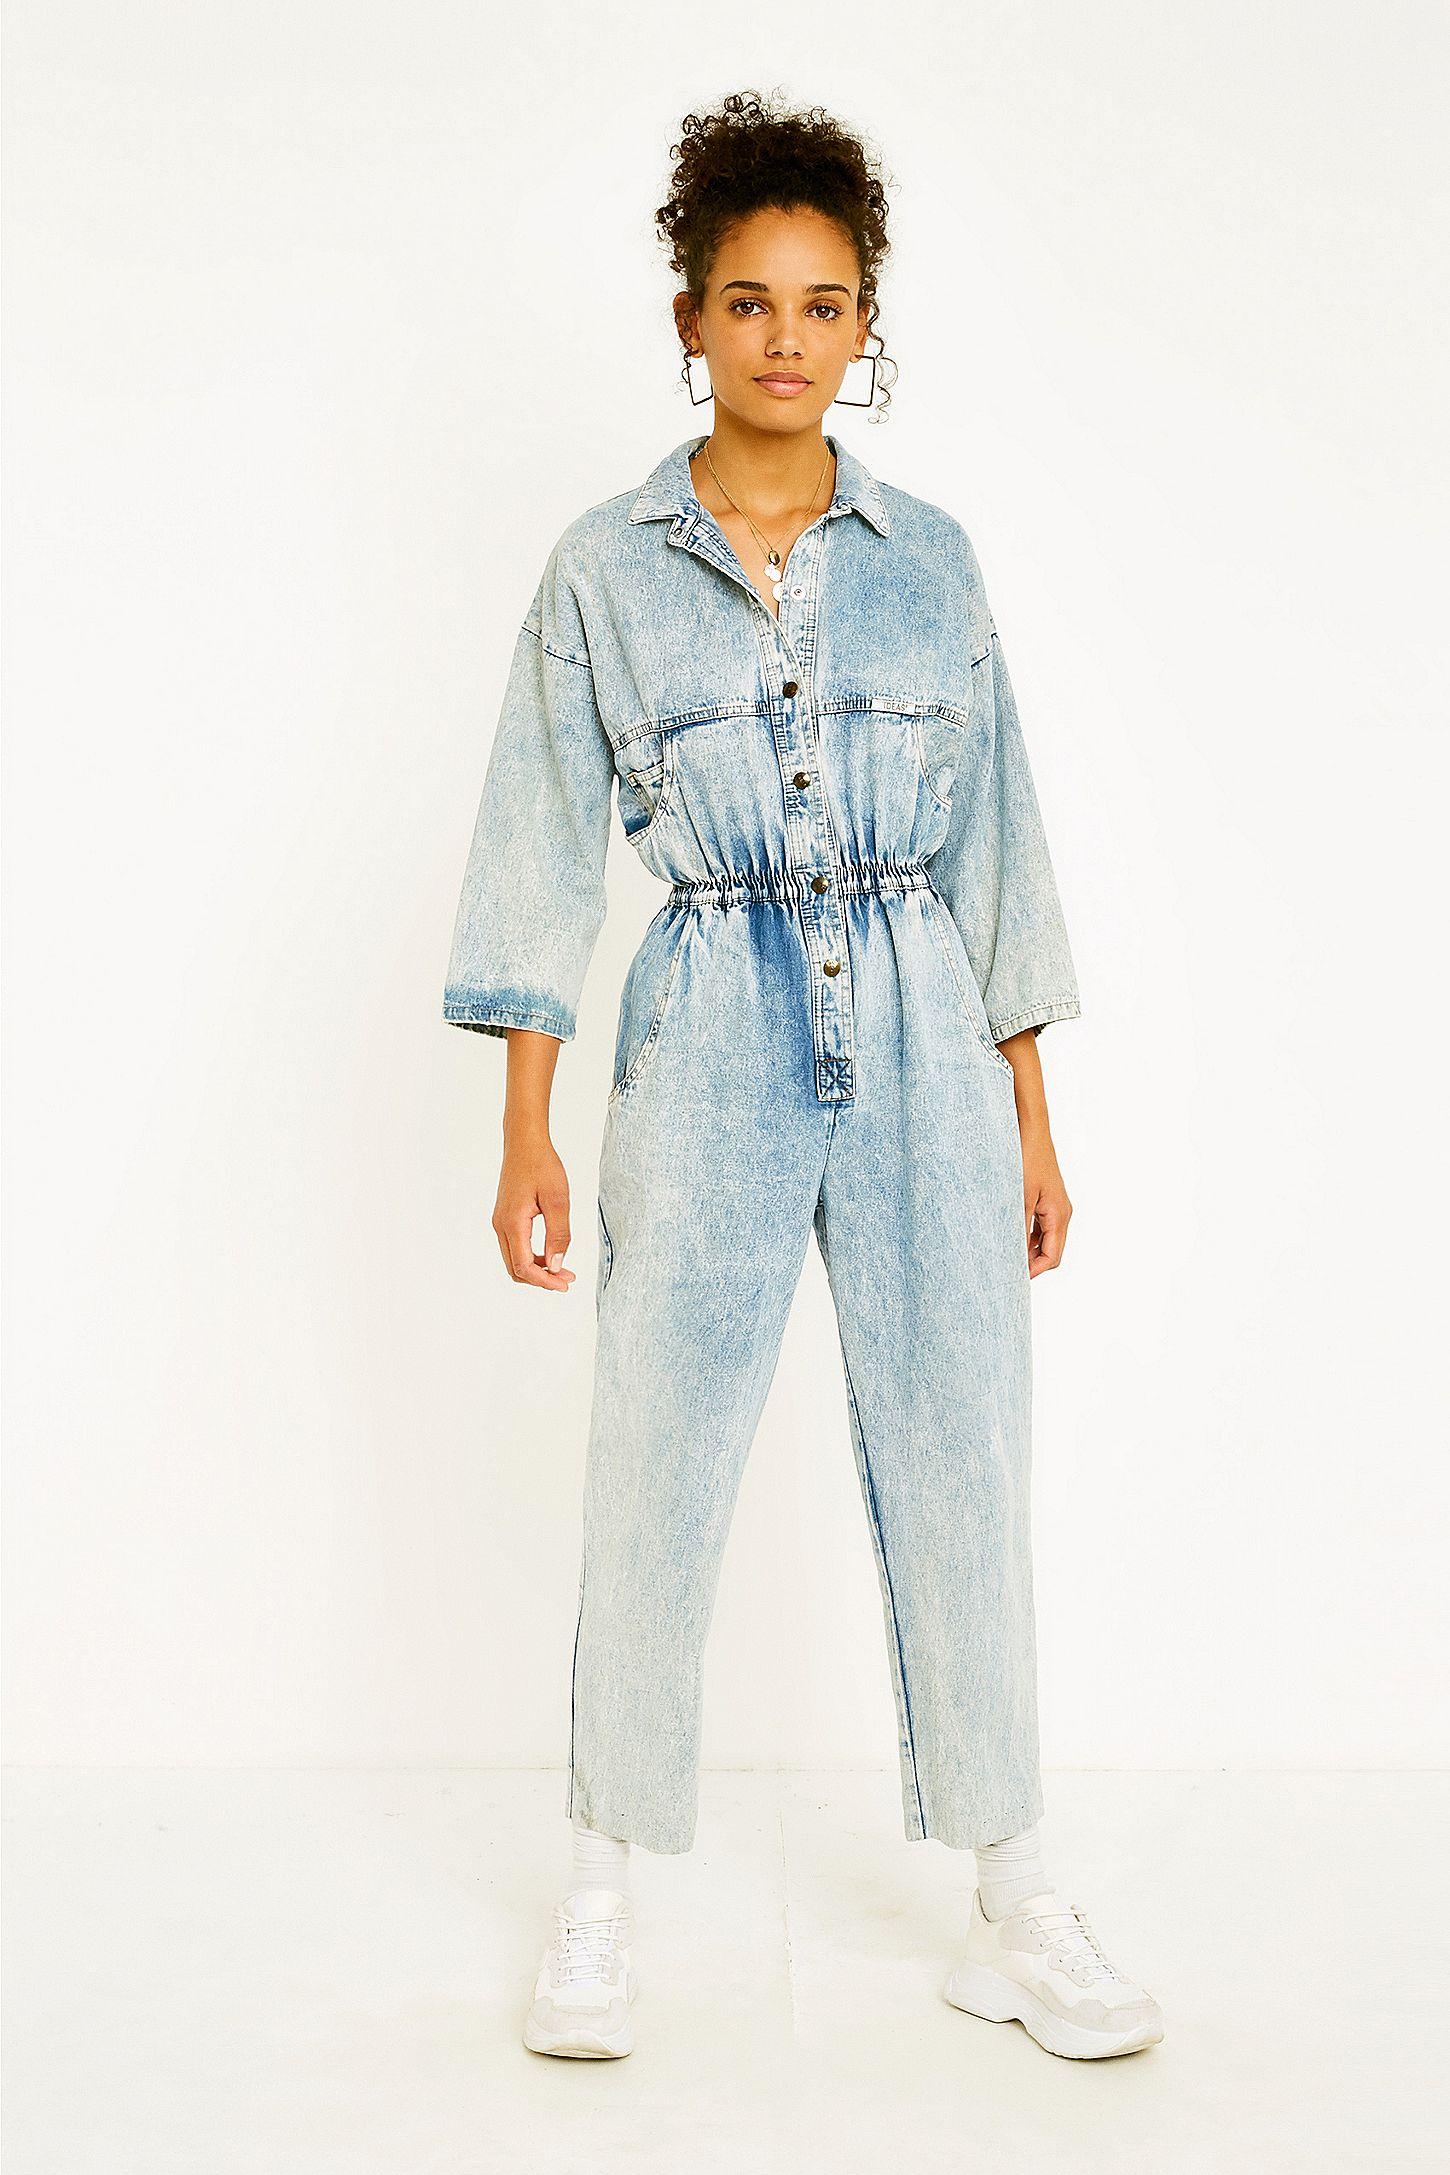 29edde804ee Urban Renewal Vintage One-of-a-Kind  80s Acid Wash Denim Jumpsuit ...